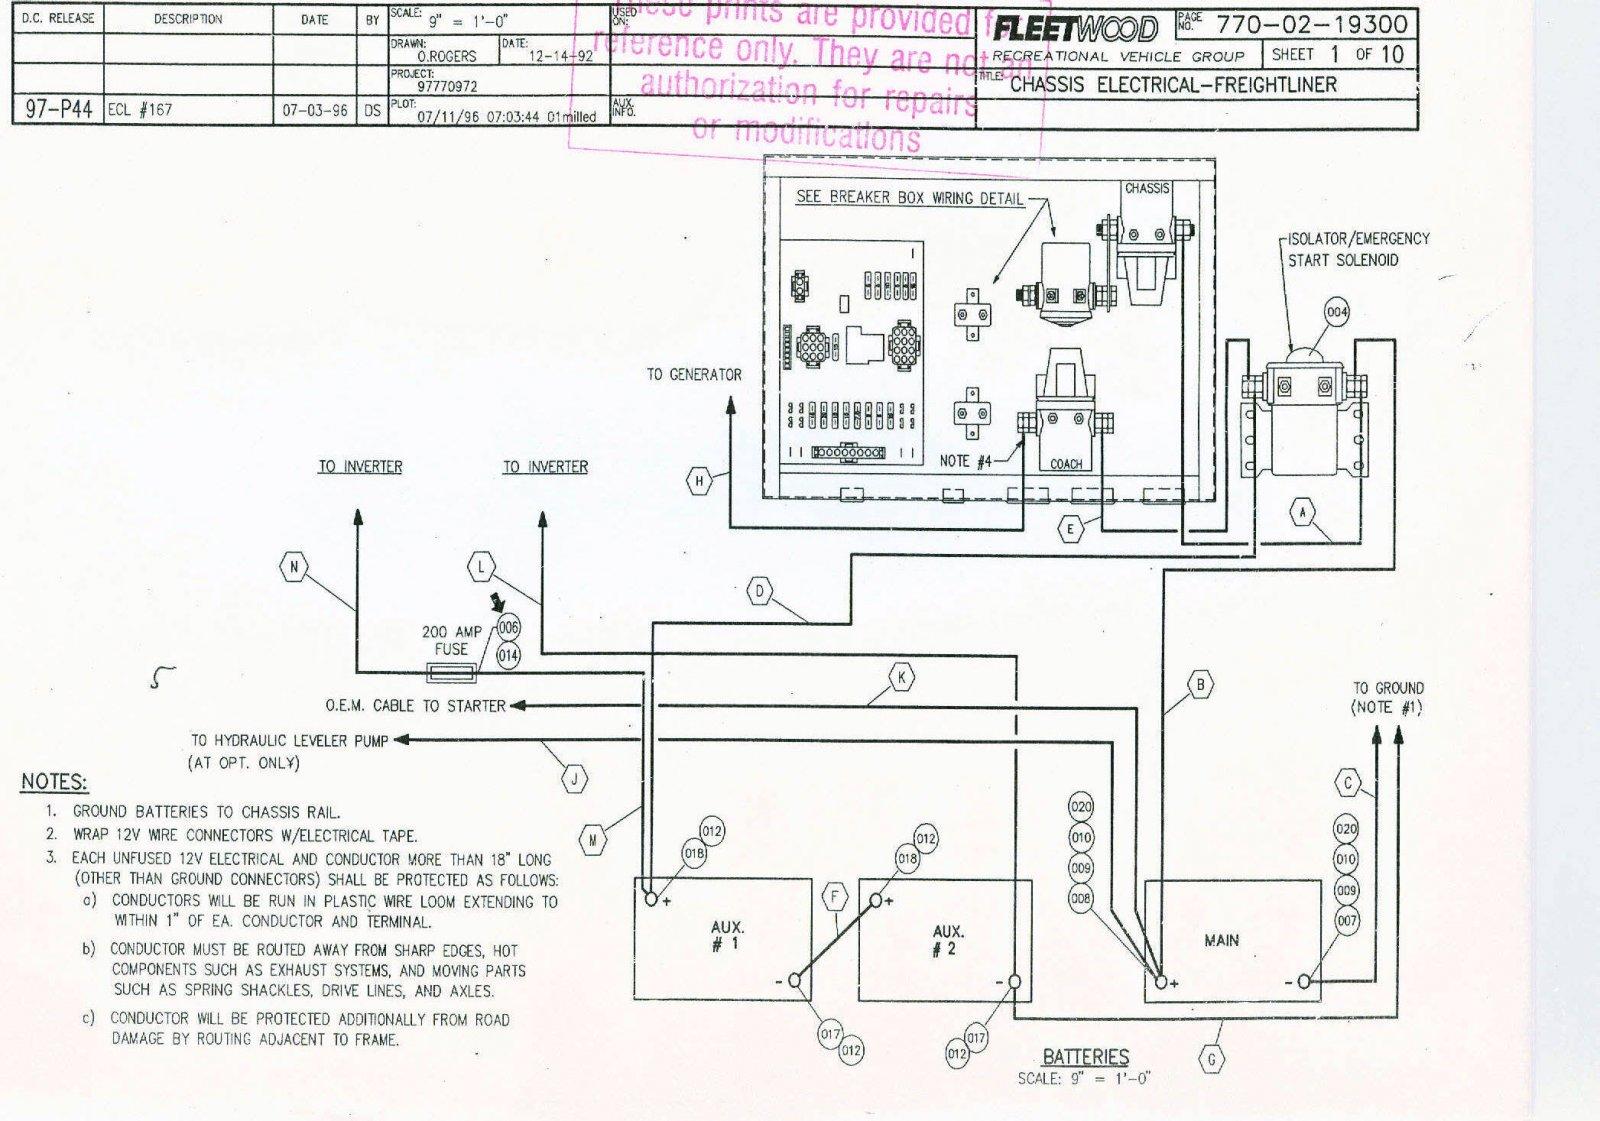 Slide Out Switch Wiring Diagram P Rails Keysstone Radioboss Bv9362bi Diagrams Chevrolet Tracker Ignition Motorhomes On Slides Auto